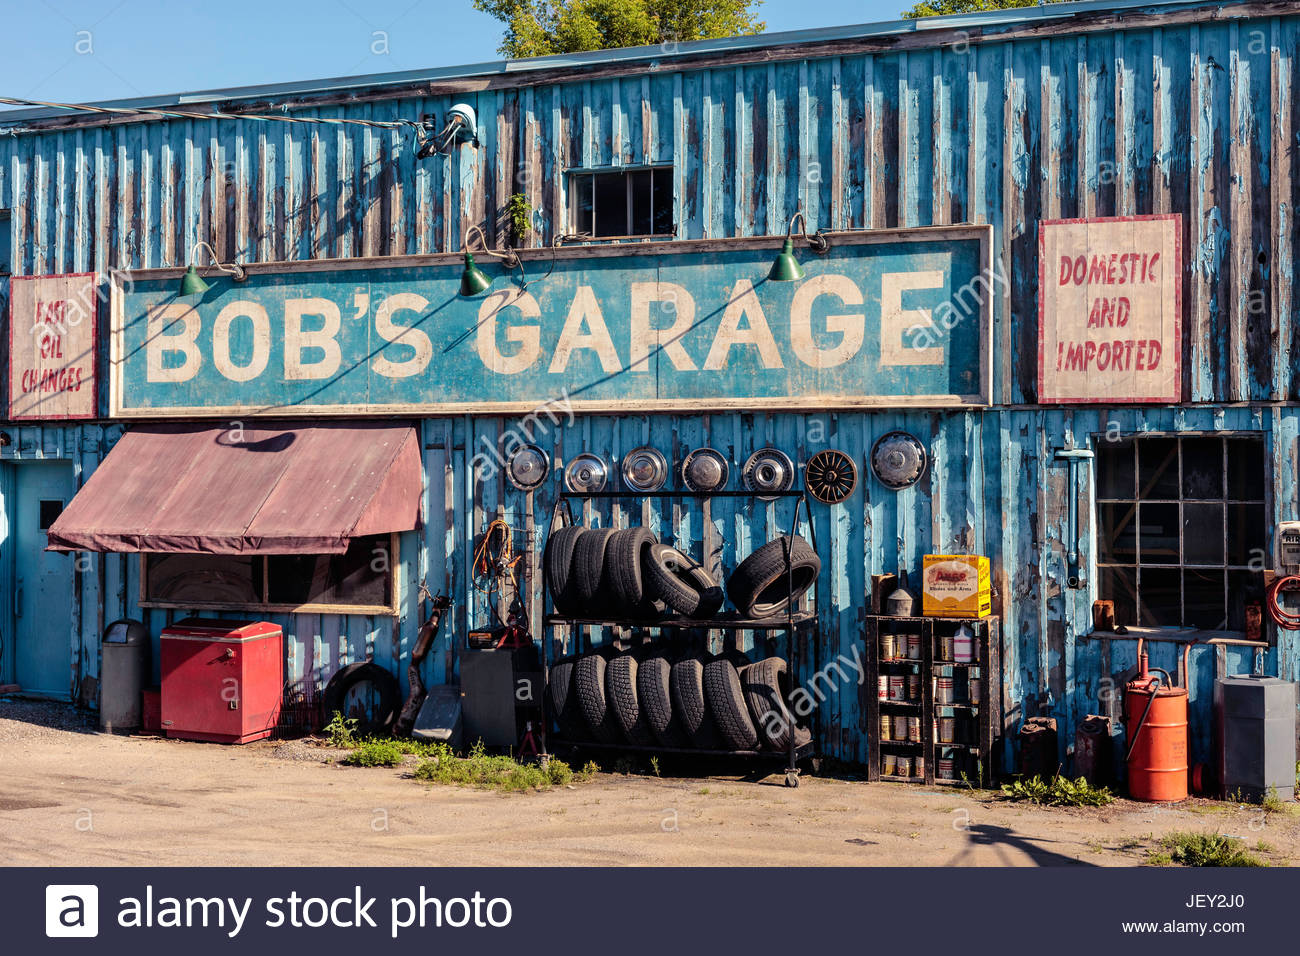 movie set film production depicting 1950s gas station garage  petrol station filling station service station automobile - Stock Image